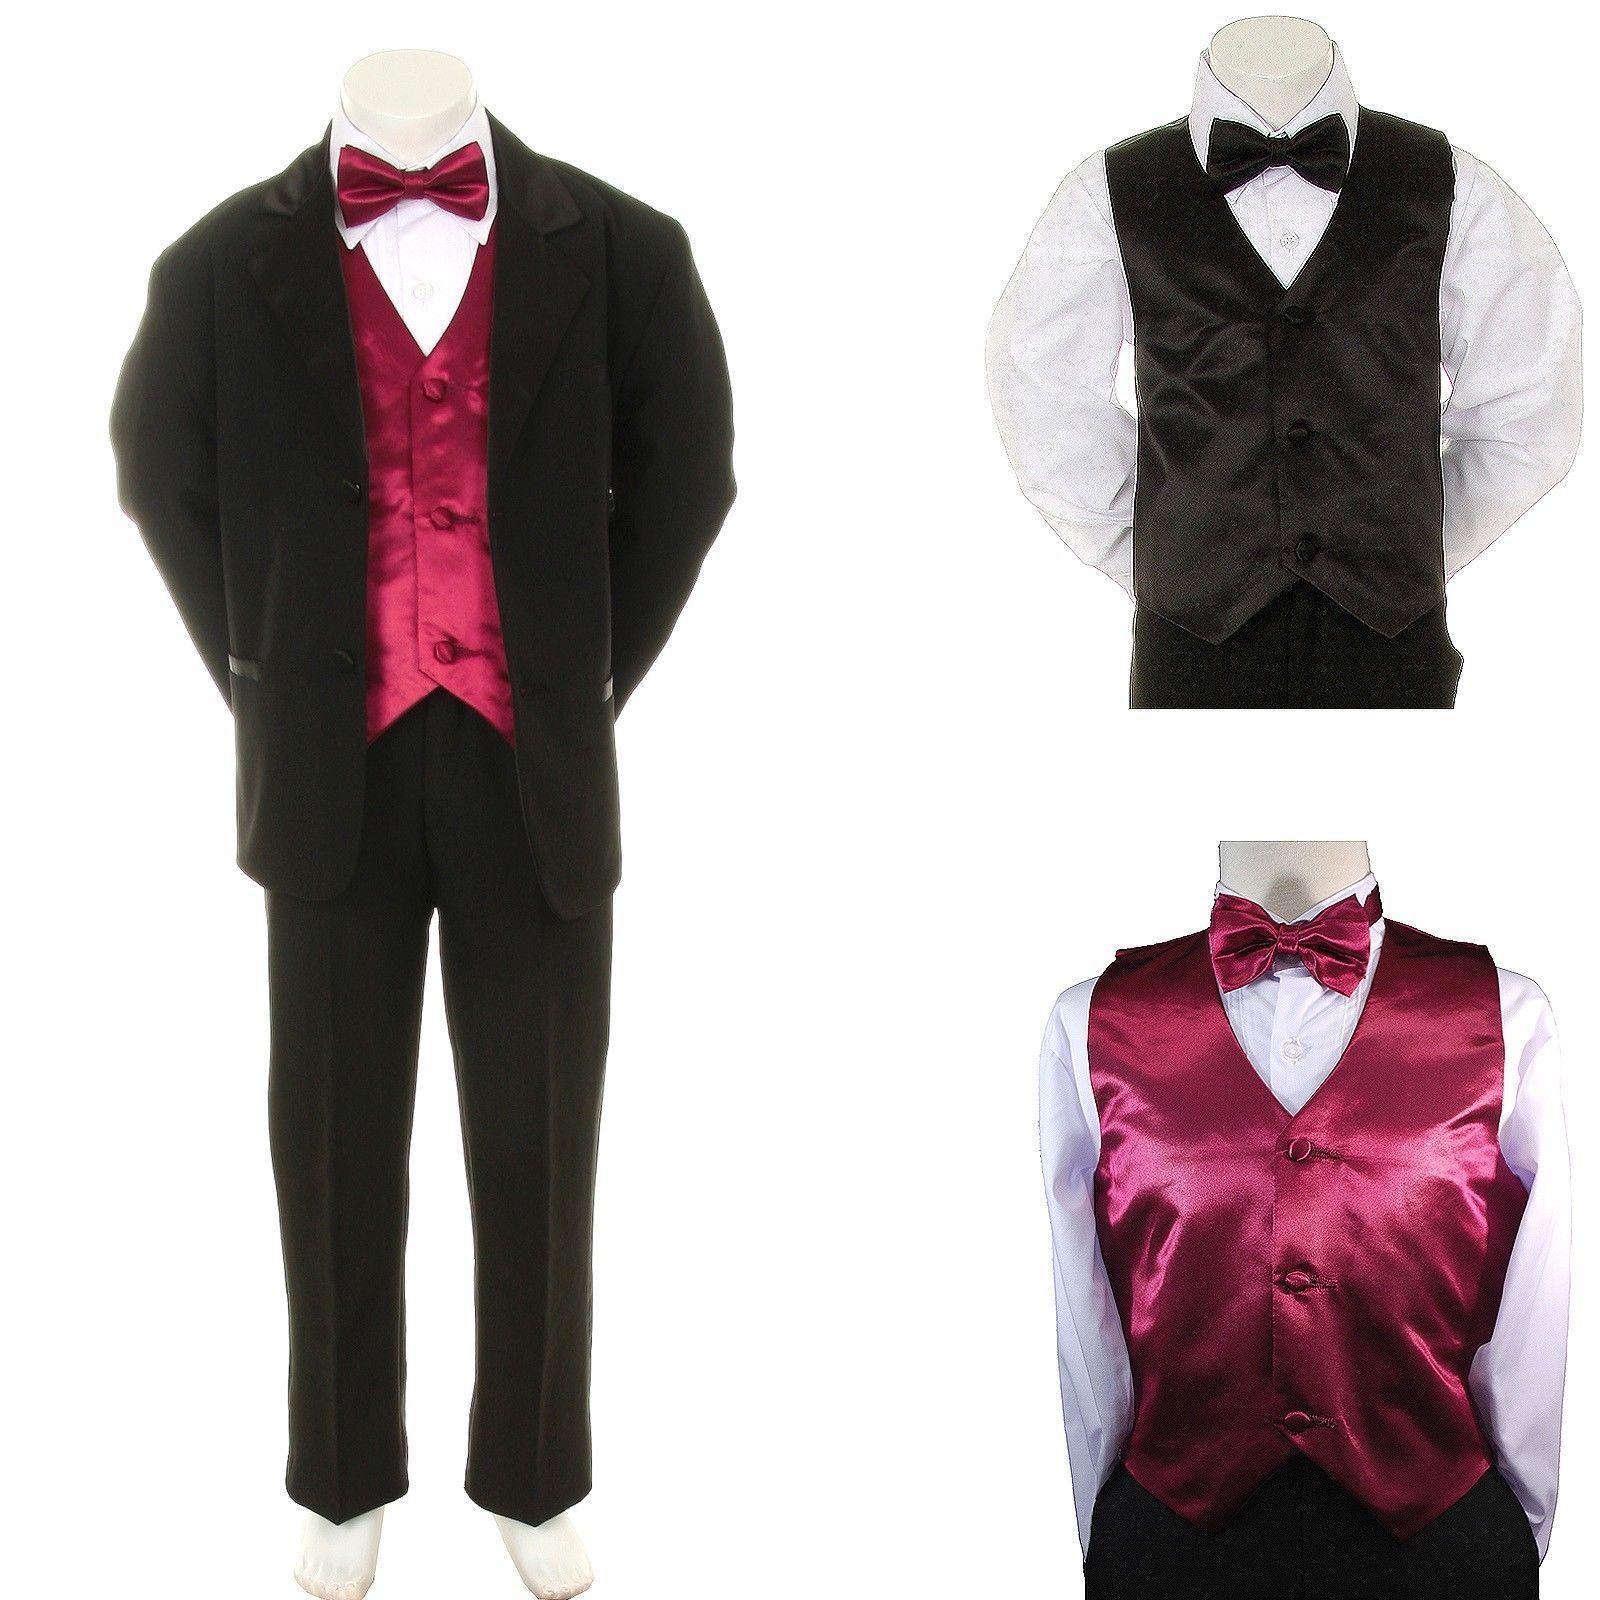 5pc Khaki Baby Toddler Teen Boys Wedding Formal Vest Necktie Tuxedo Suits S-20